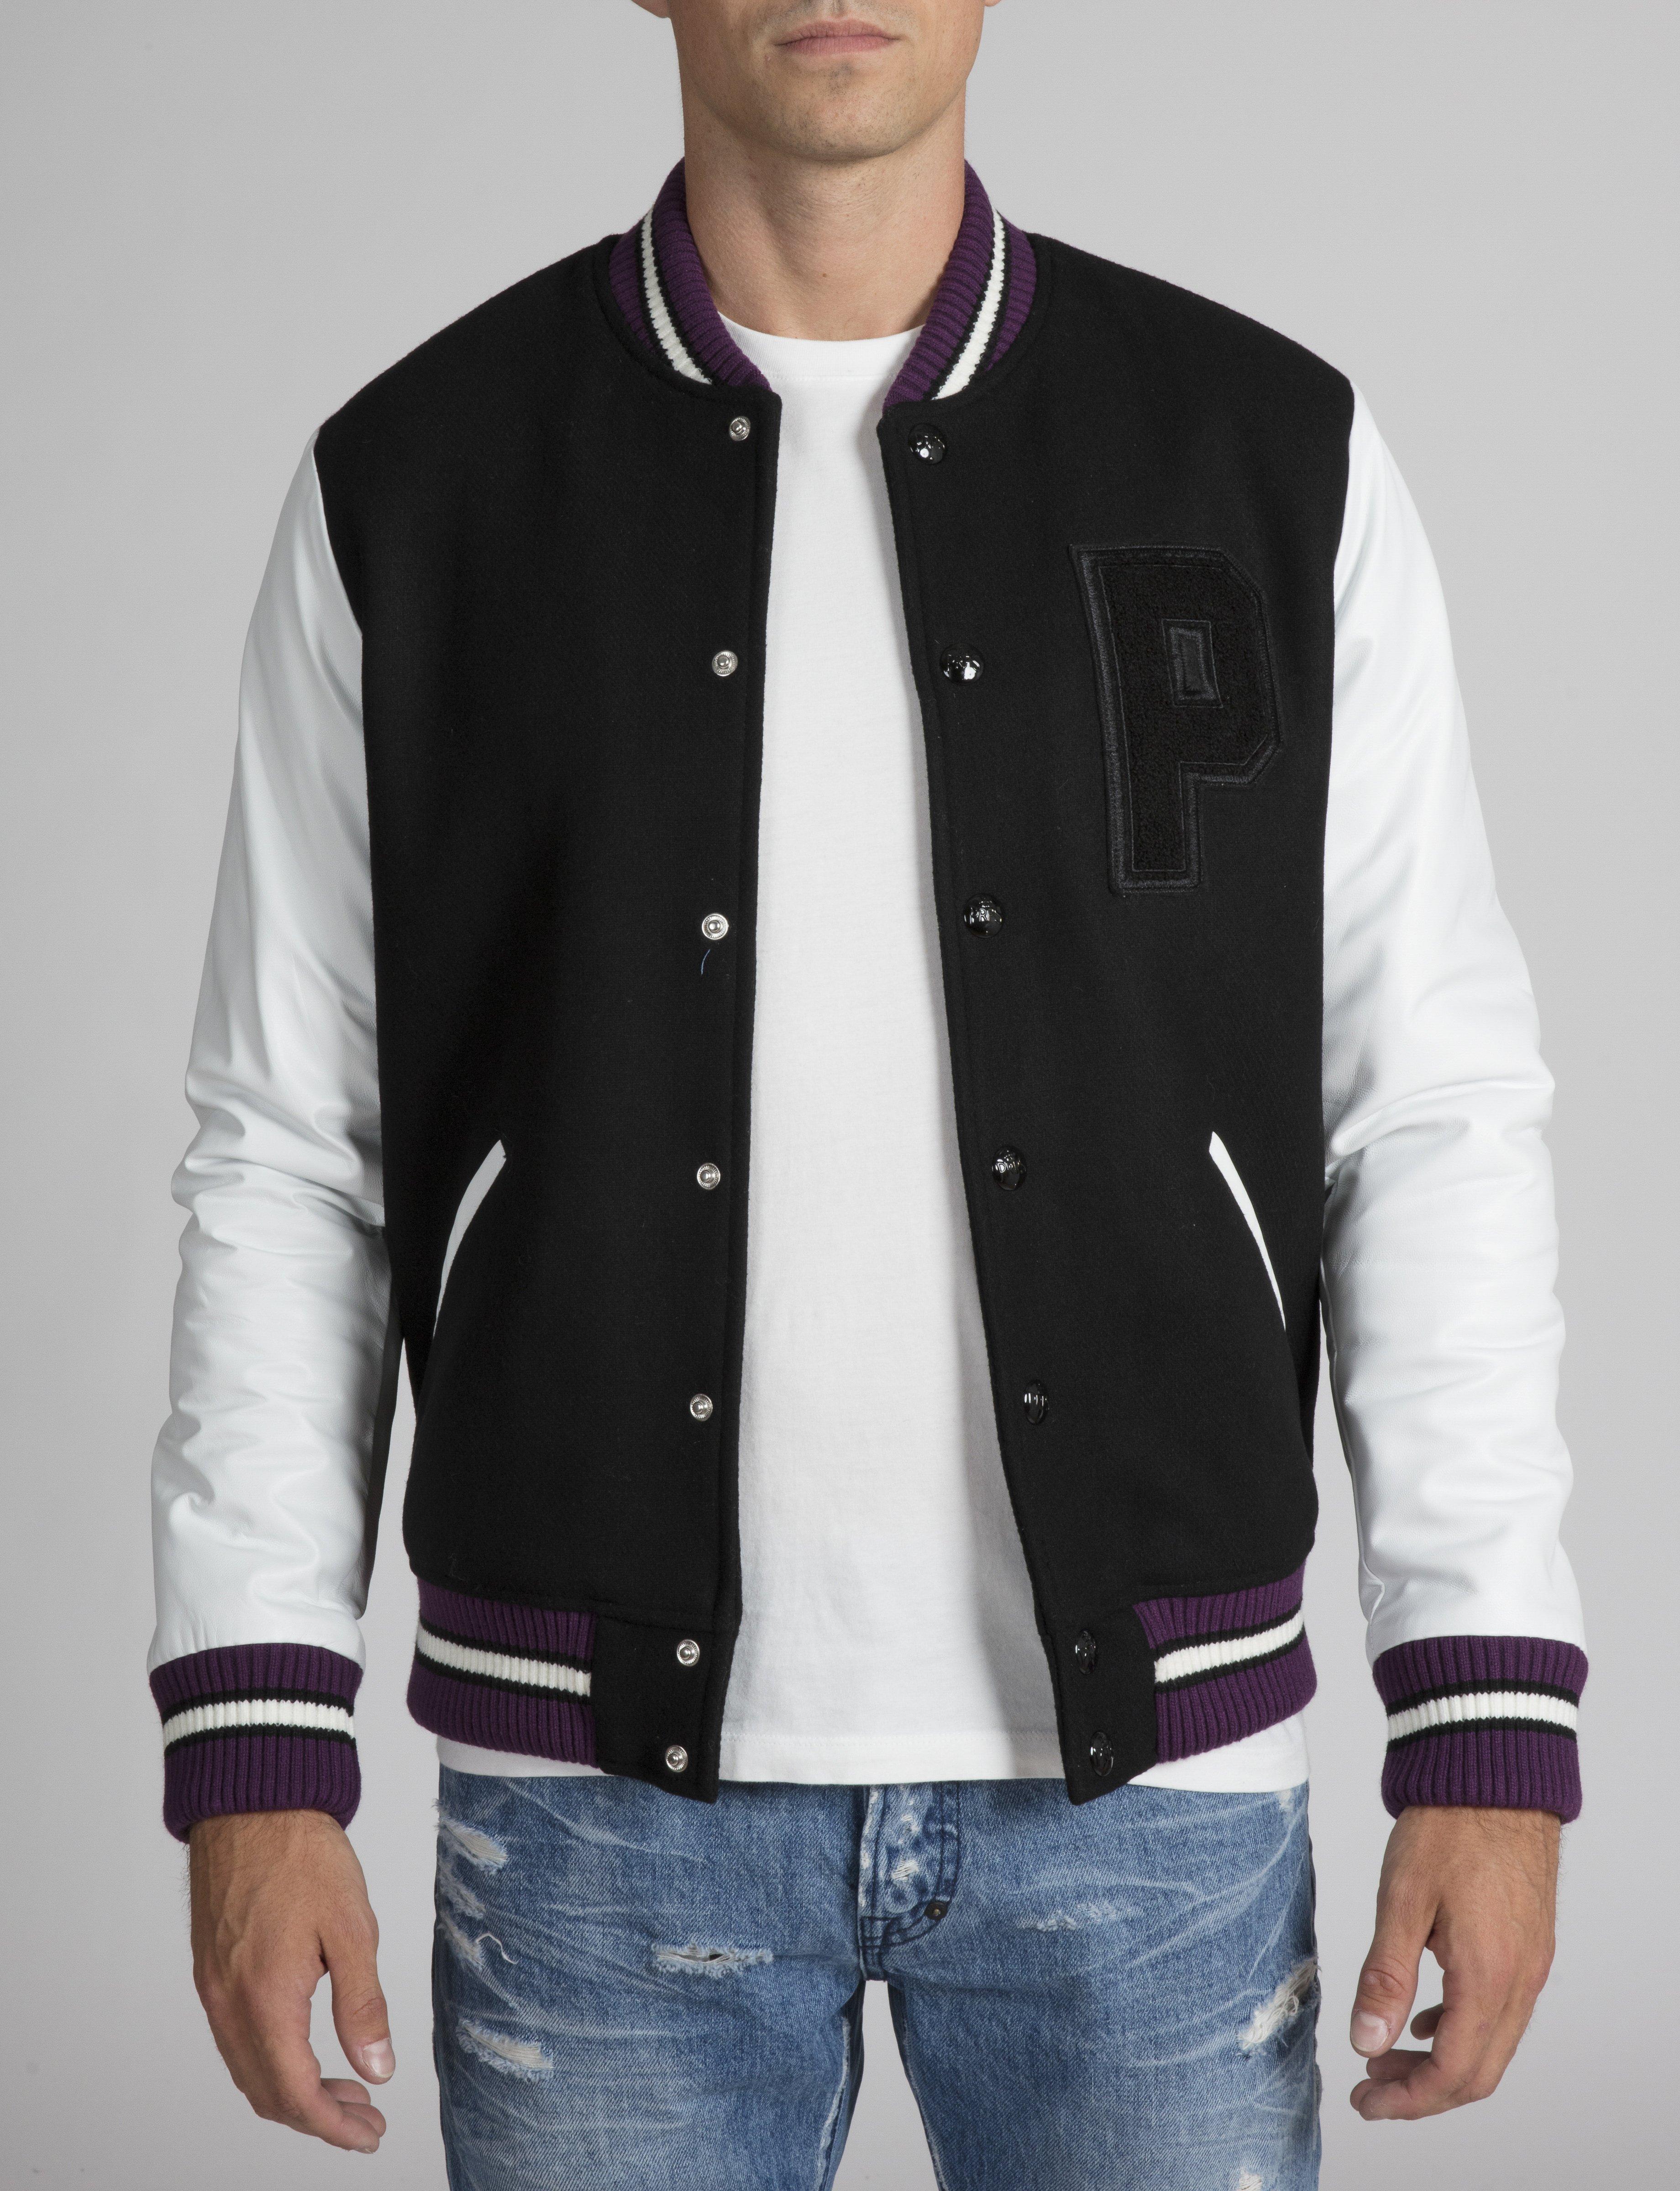 Give 'Em Hell Varsity Jacket #varsityjacketoutfit Give 'Em Hell Varsity Jacket #varsityjacketoutfit Give 'Em Hell Varsity Jacket #varsityjacketoutfit Give 'Em Hell Varsity Jacket #varsityjacketoutfit